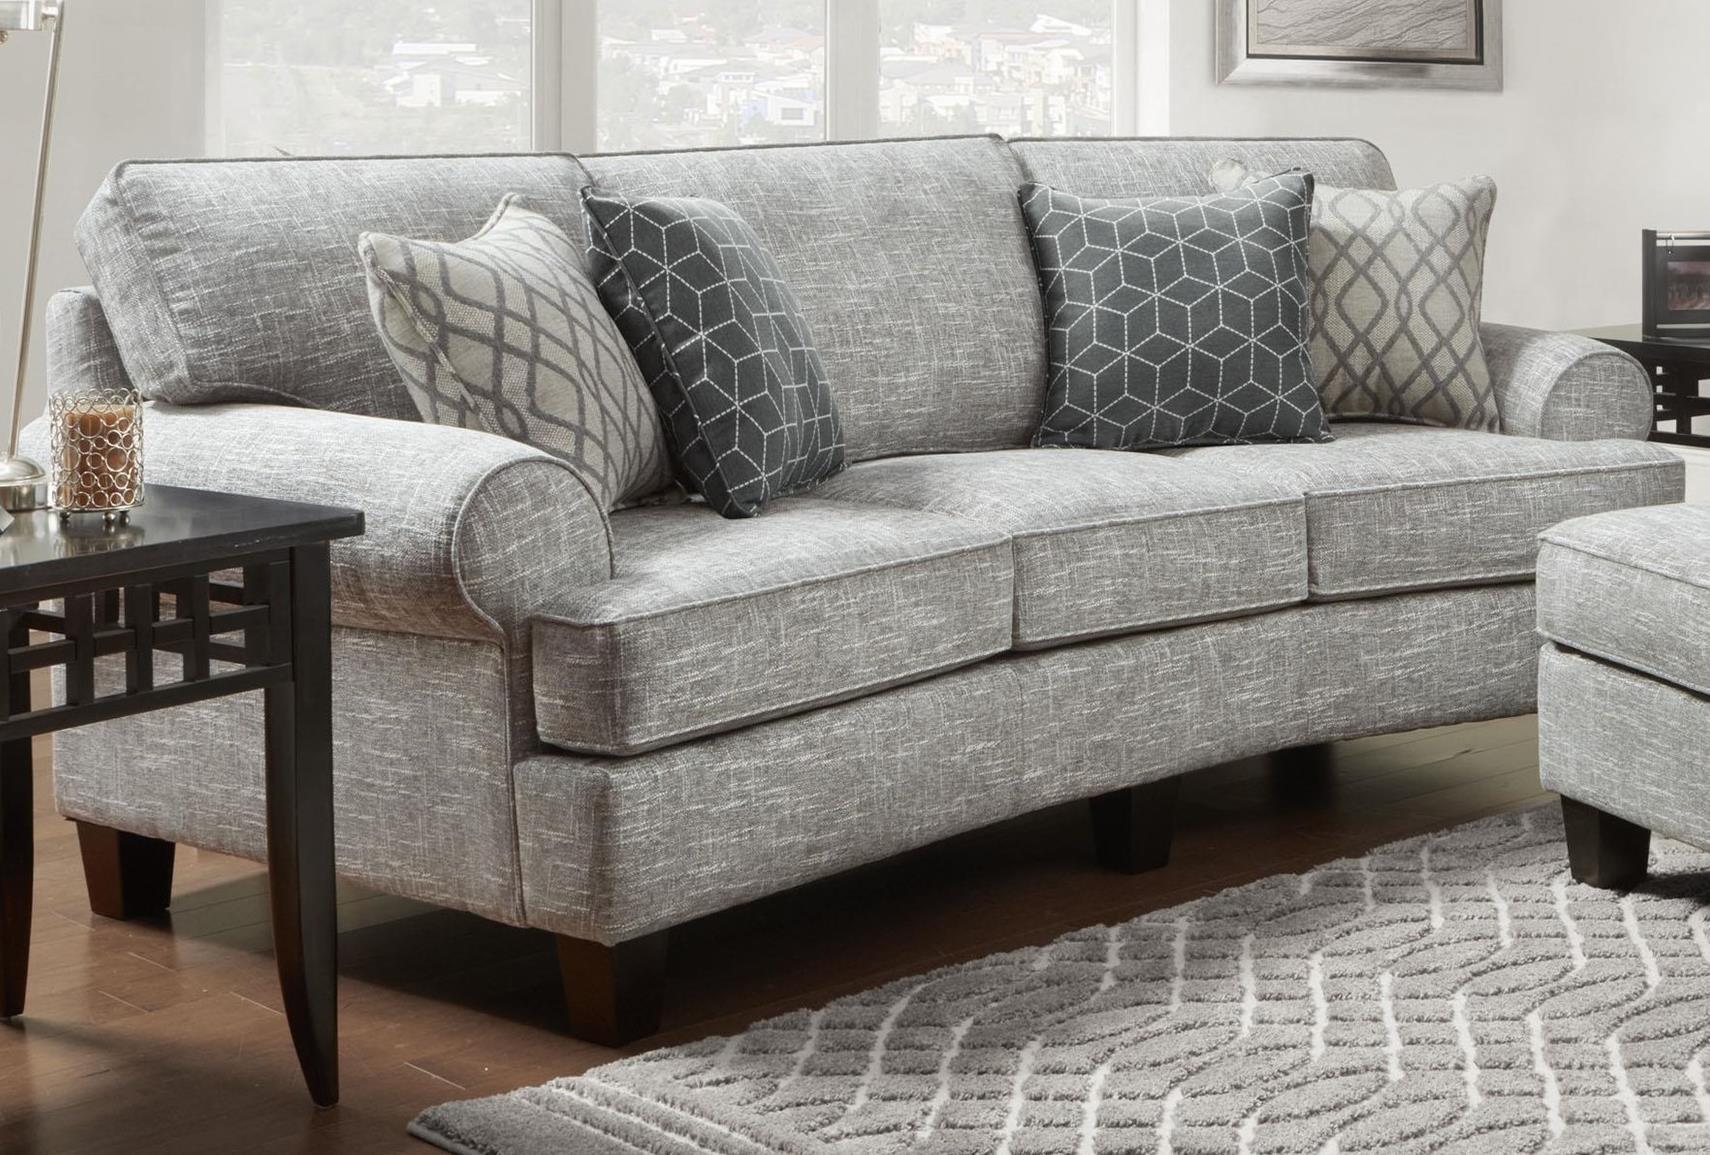 Medlock Conversation Sofa at Rotmans